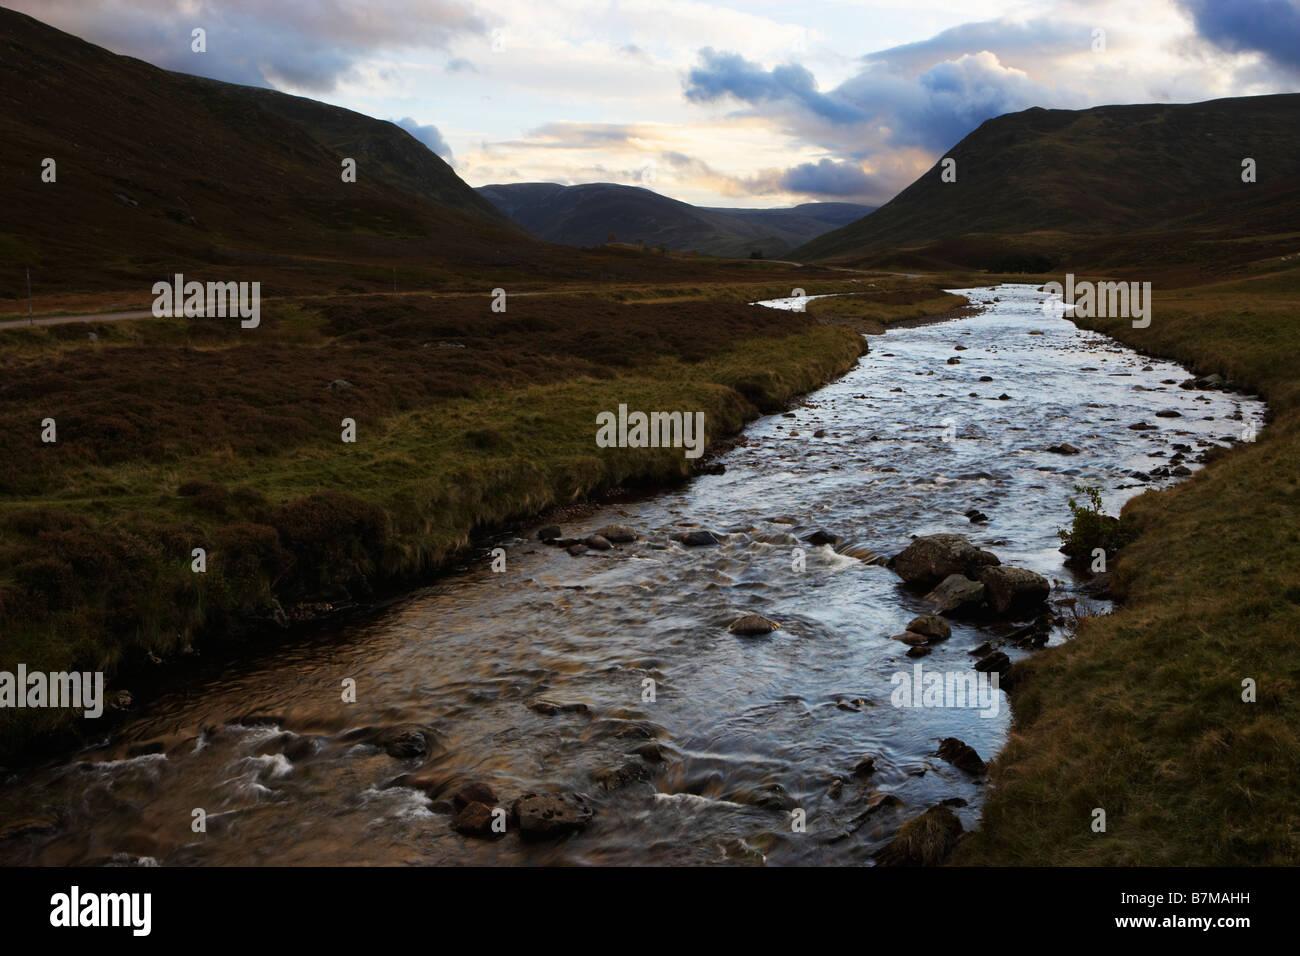 Clunie Water running through Grampian Mountains at dusk Aberdeenshire Scotland - Stock Image